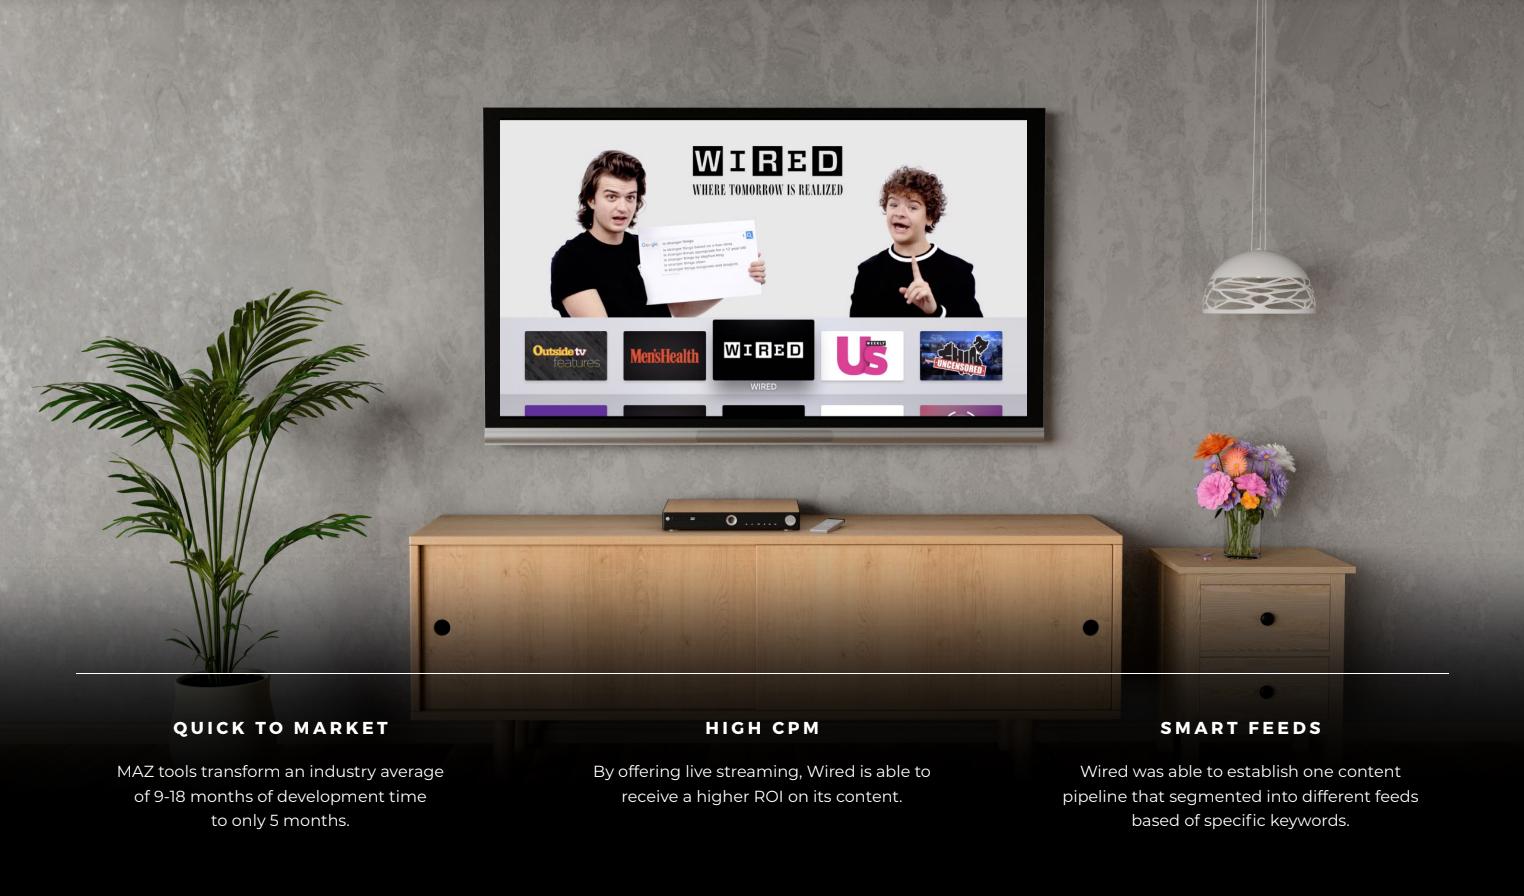 wired ott tv app case study